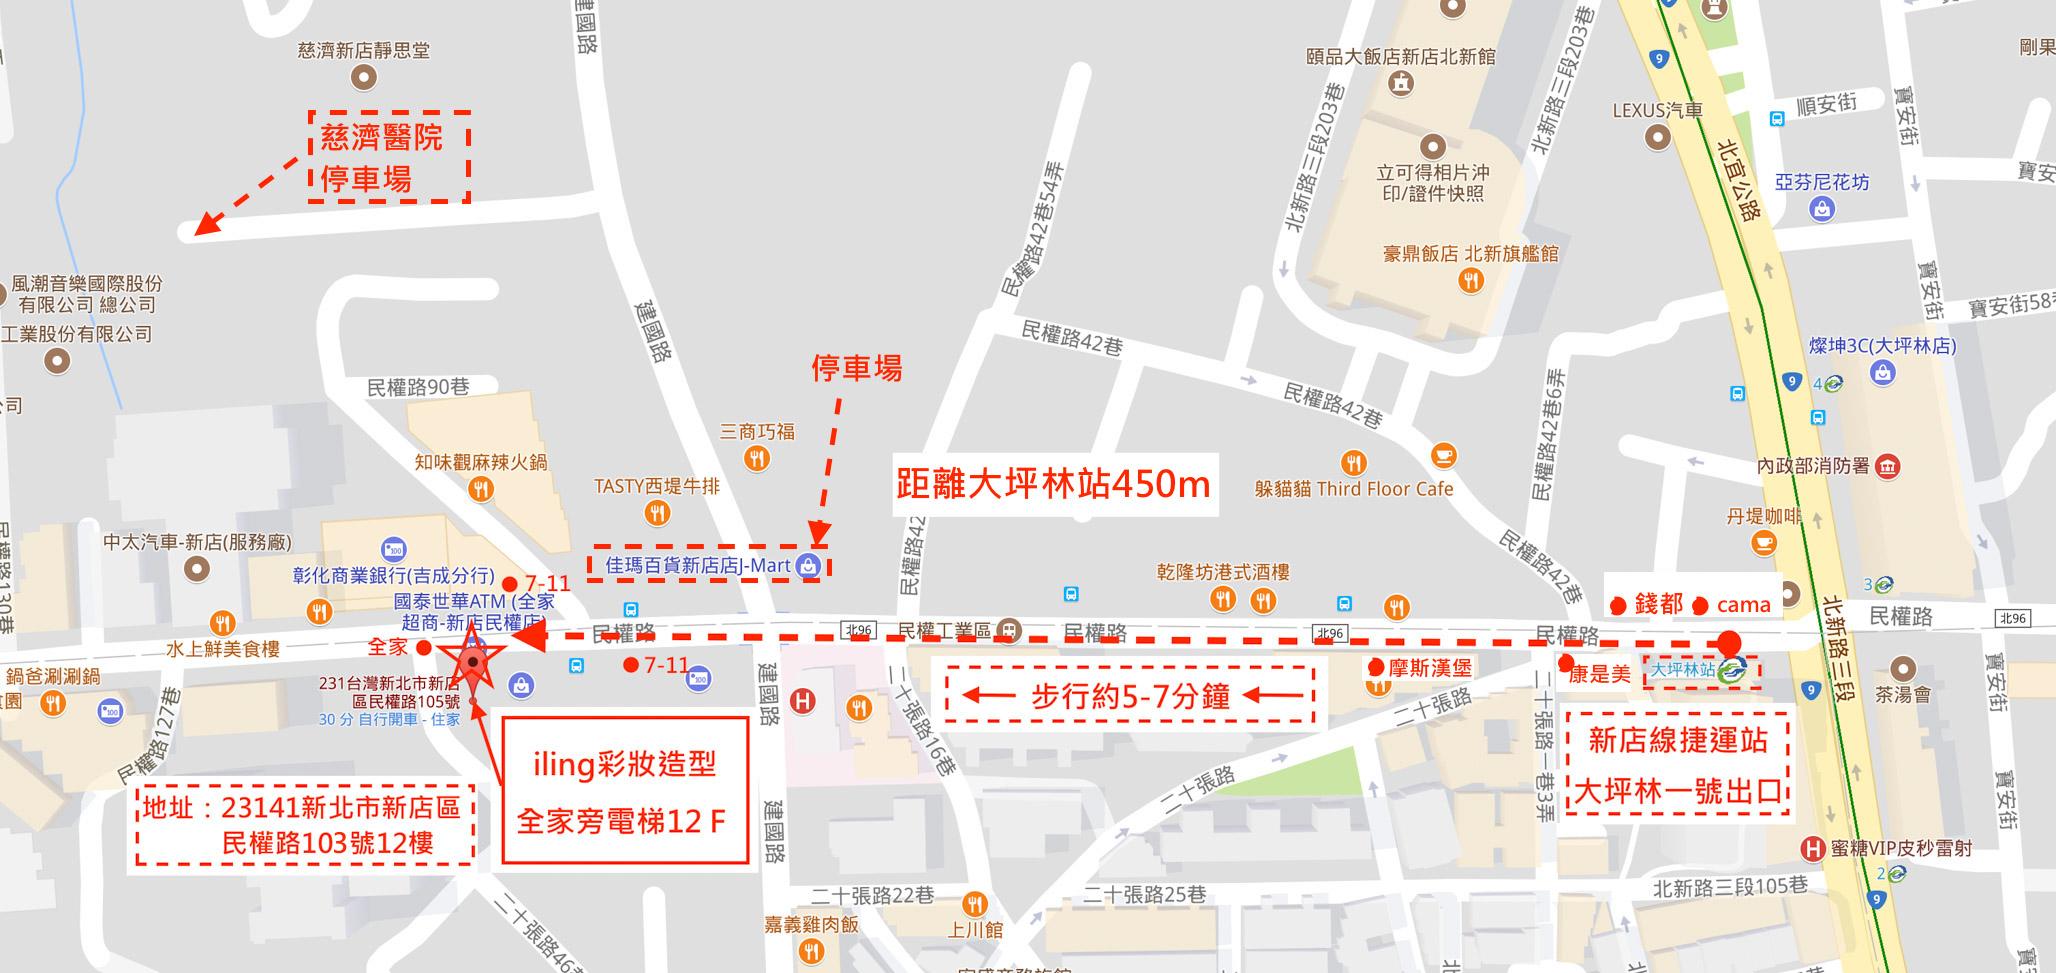 iling彩妝造型路線圖